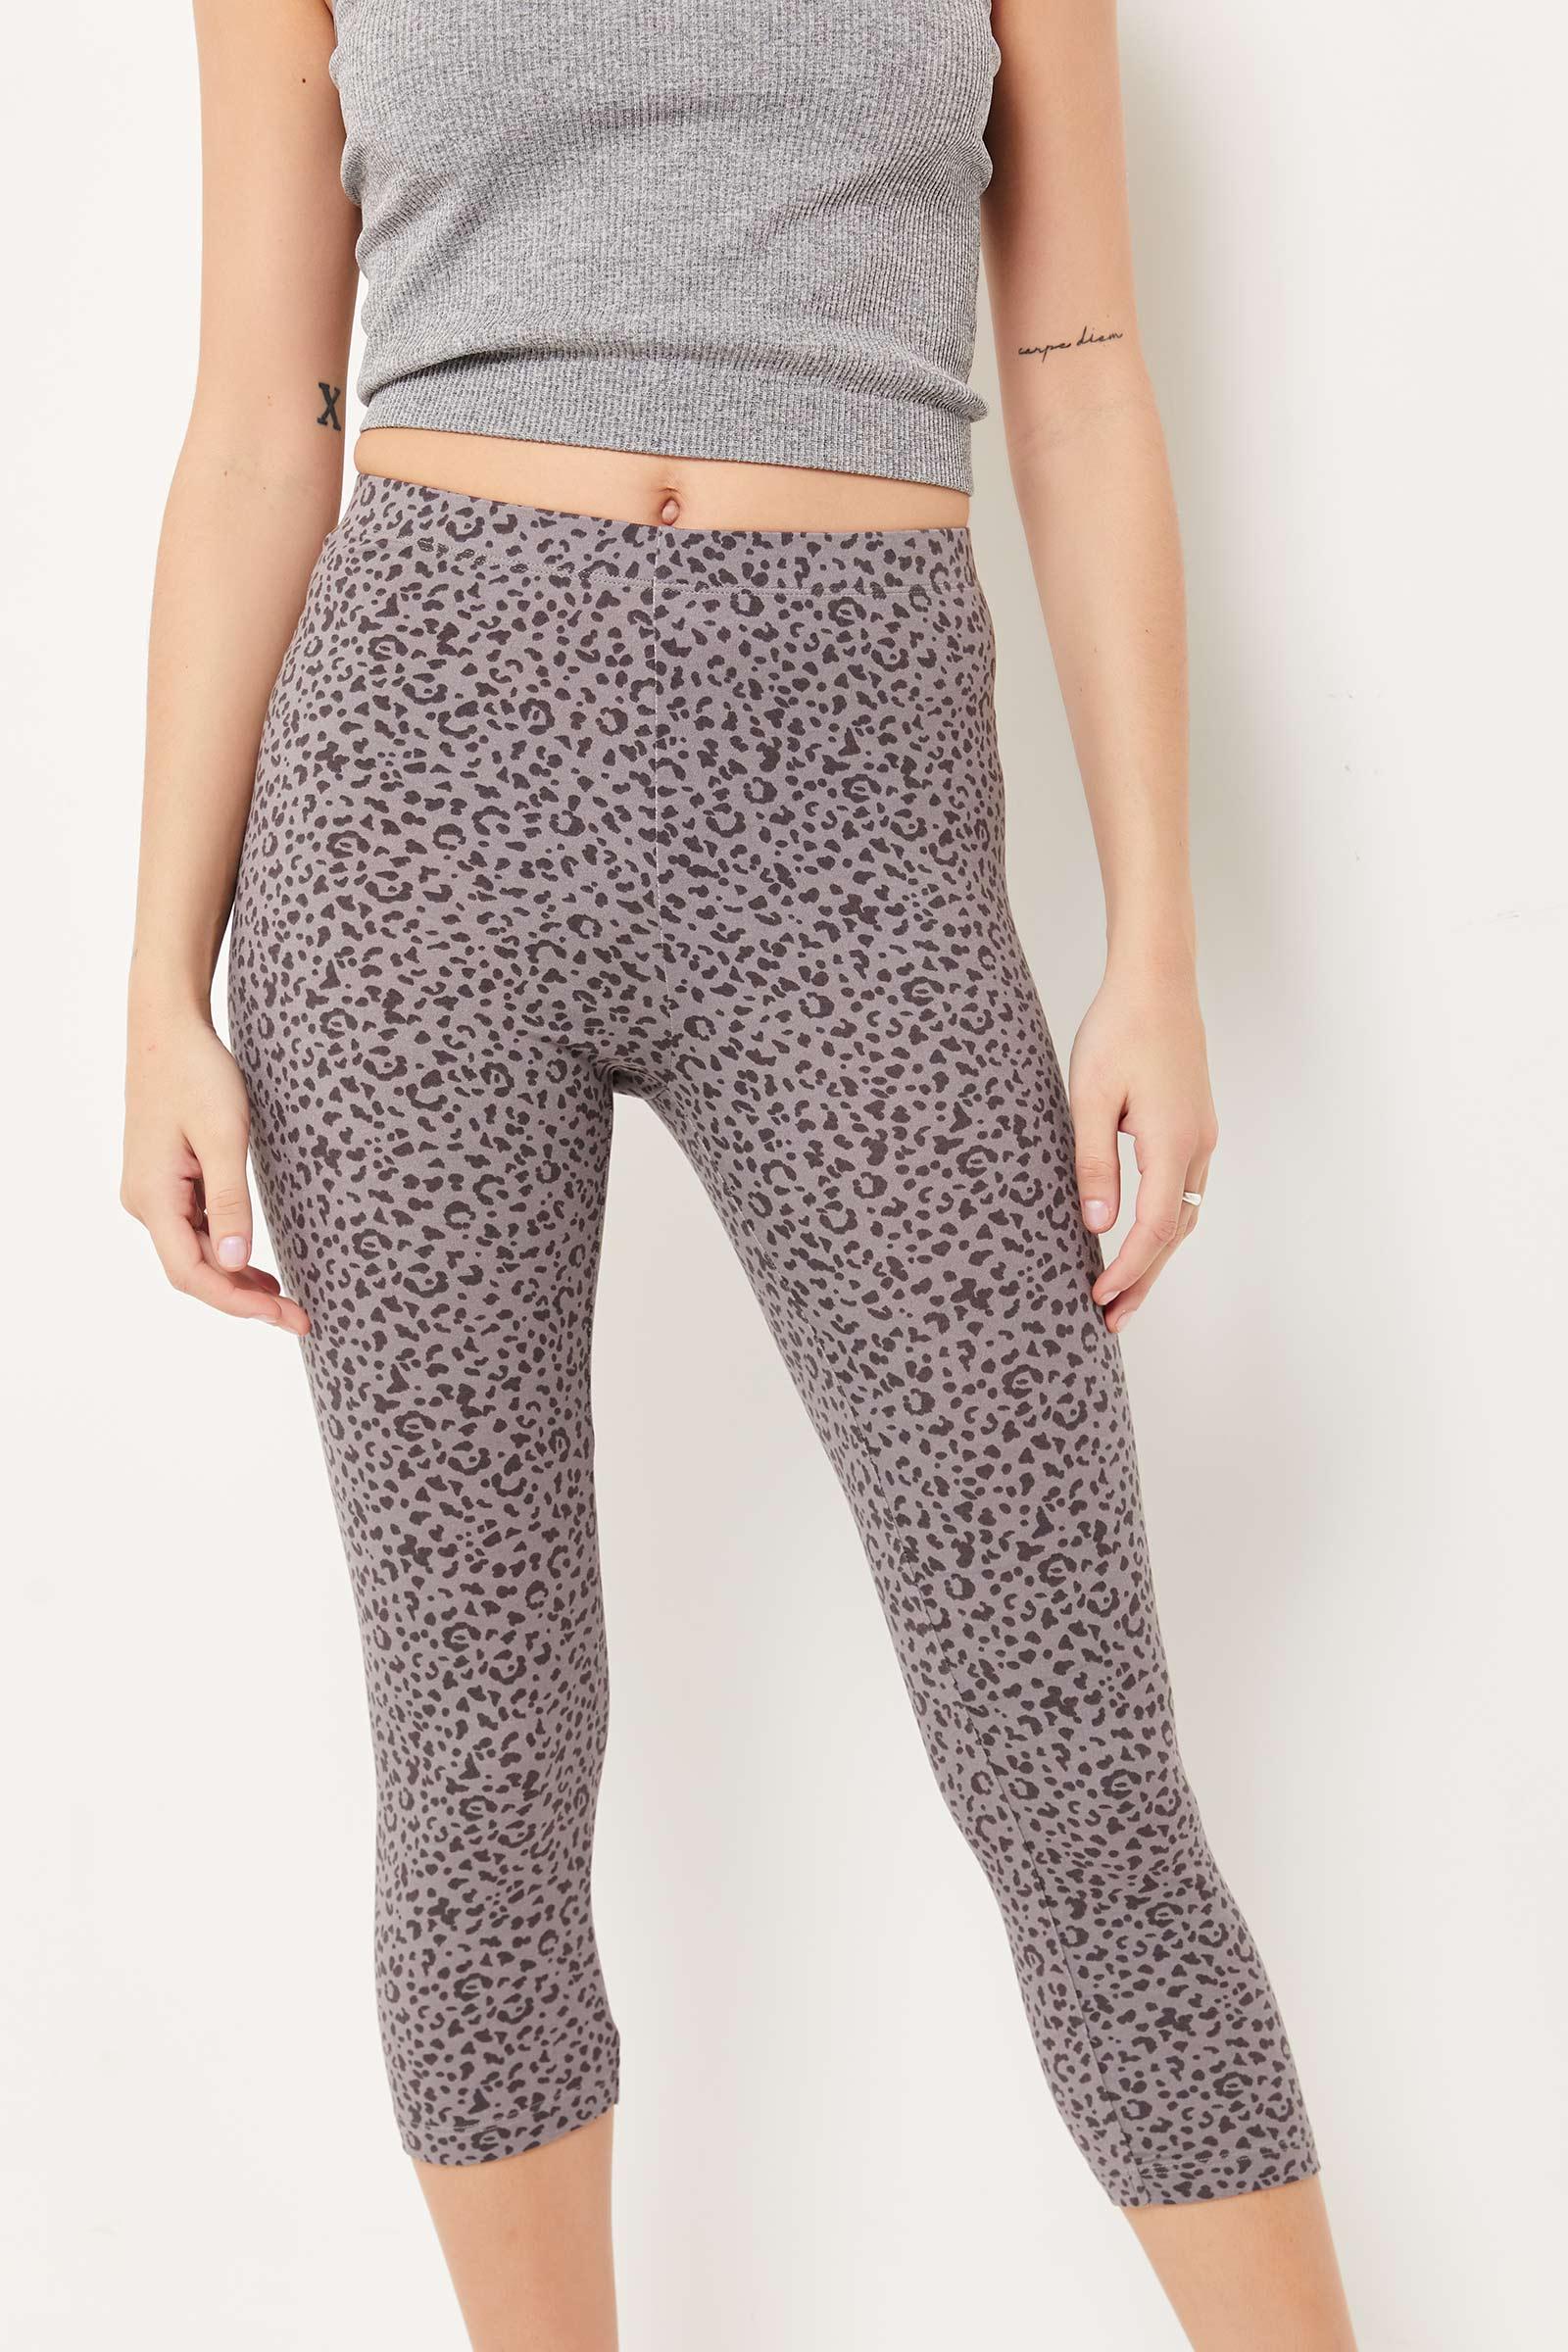 Leopard Crop Leggings